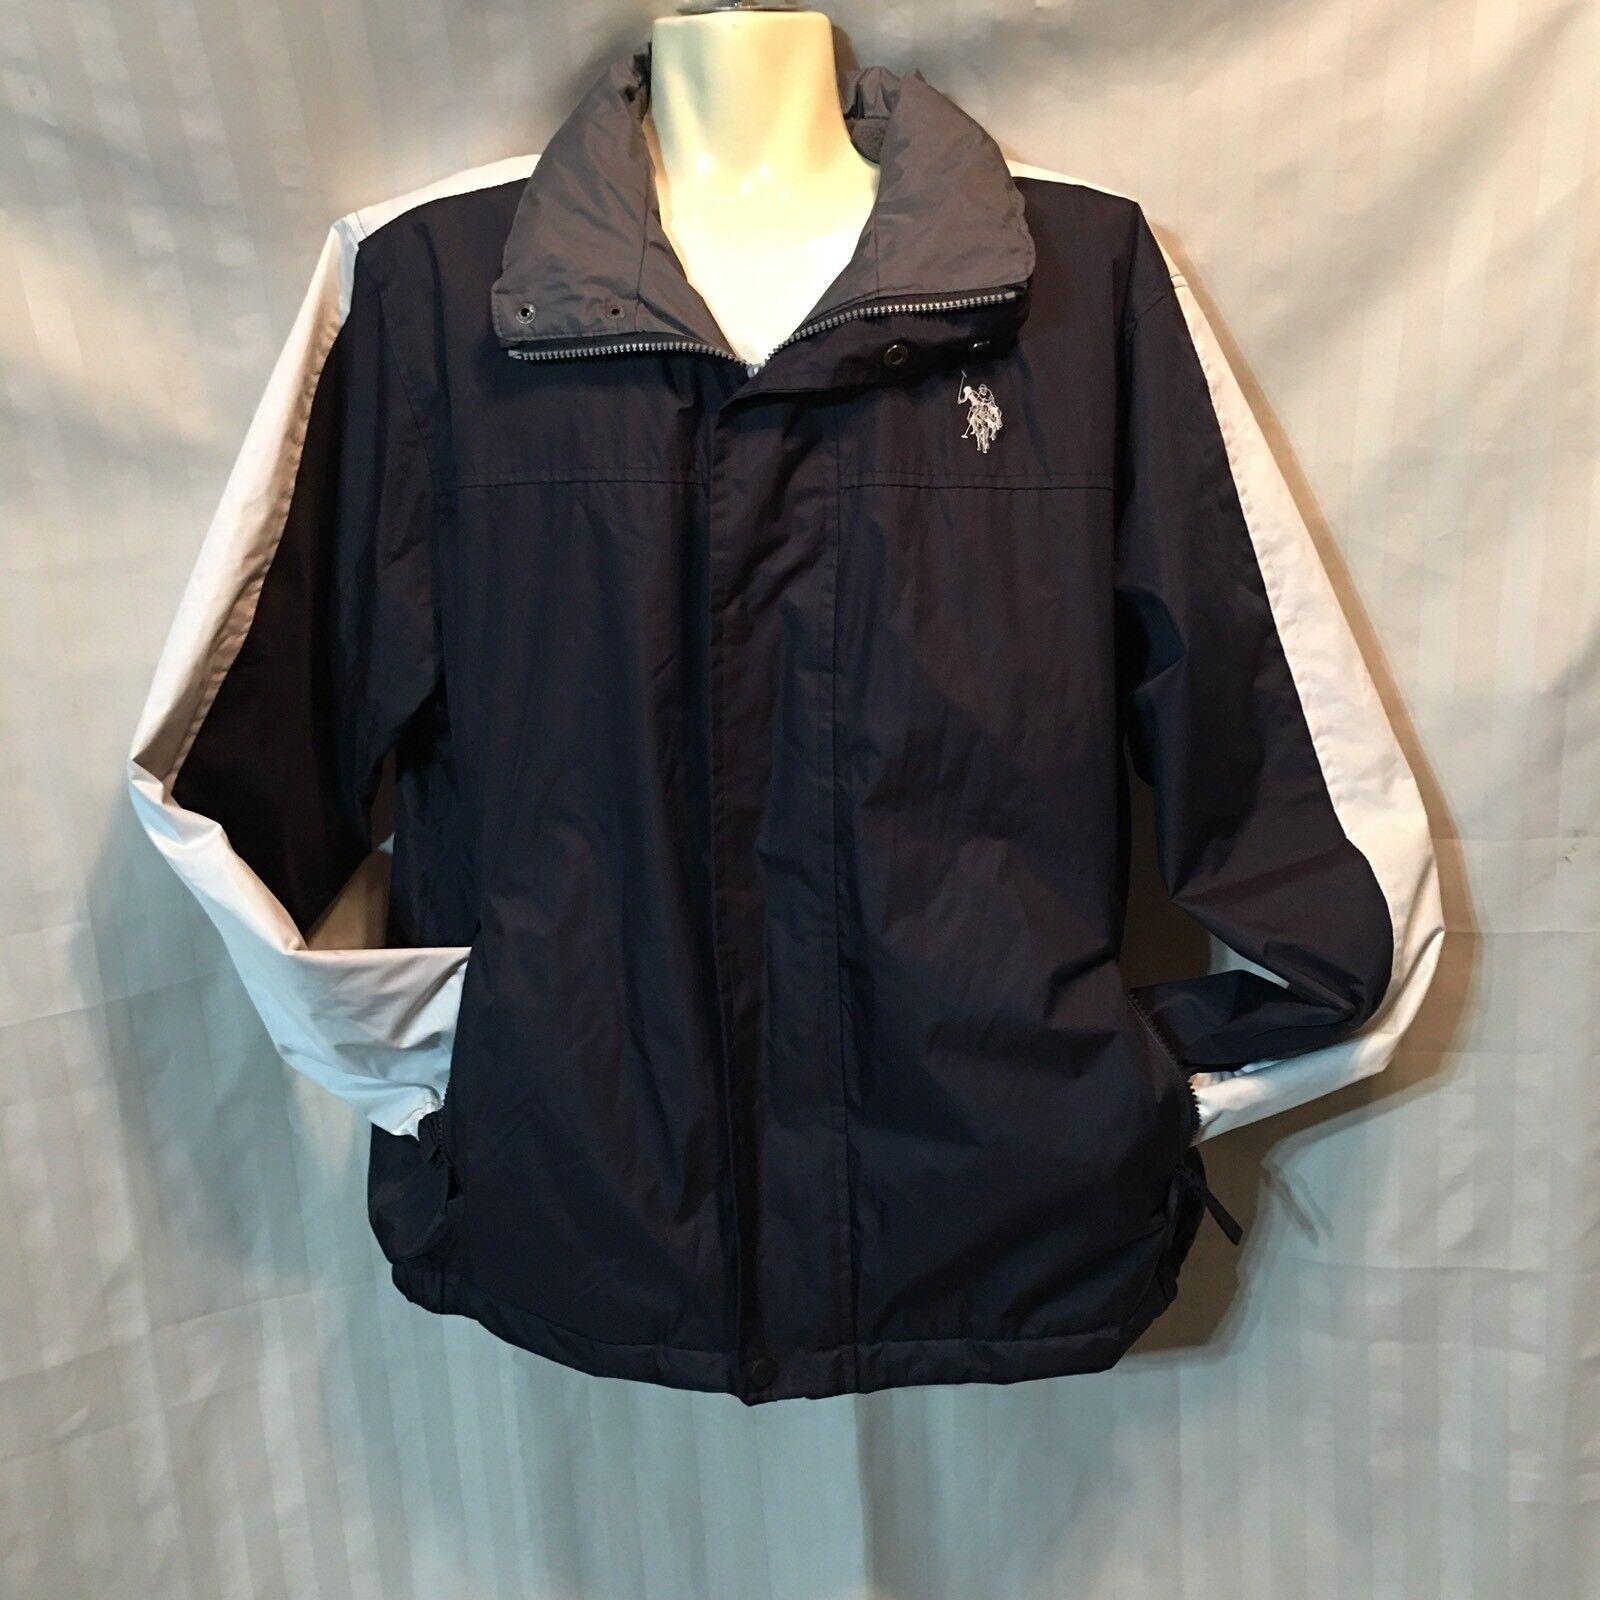 d68a54bba US Polo Association Coat Lined Hood Large Men's npuqbb3697-Coats ...